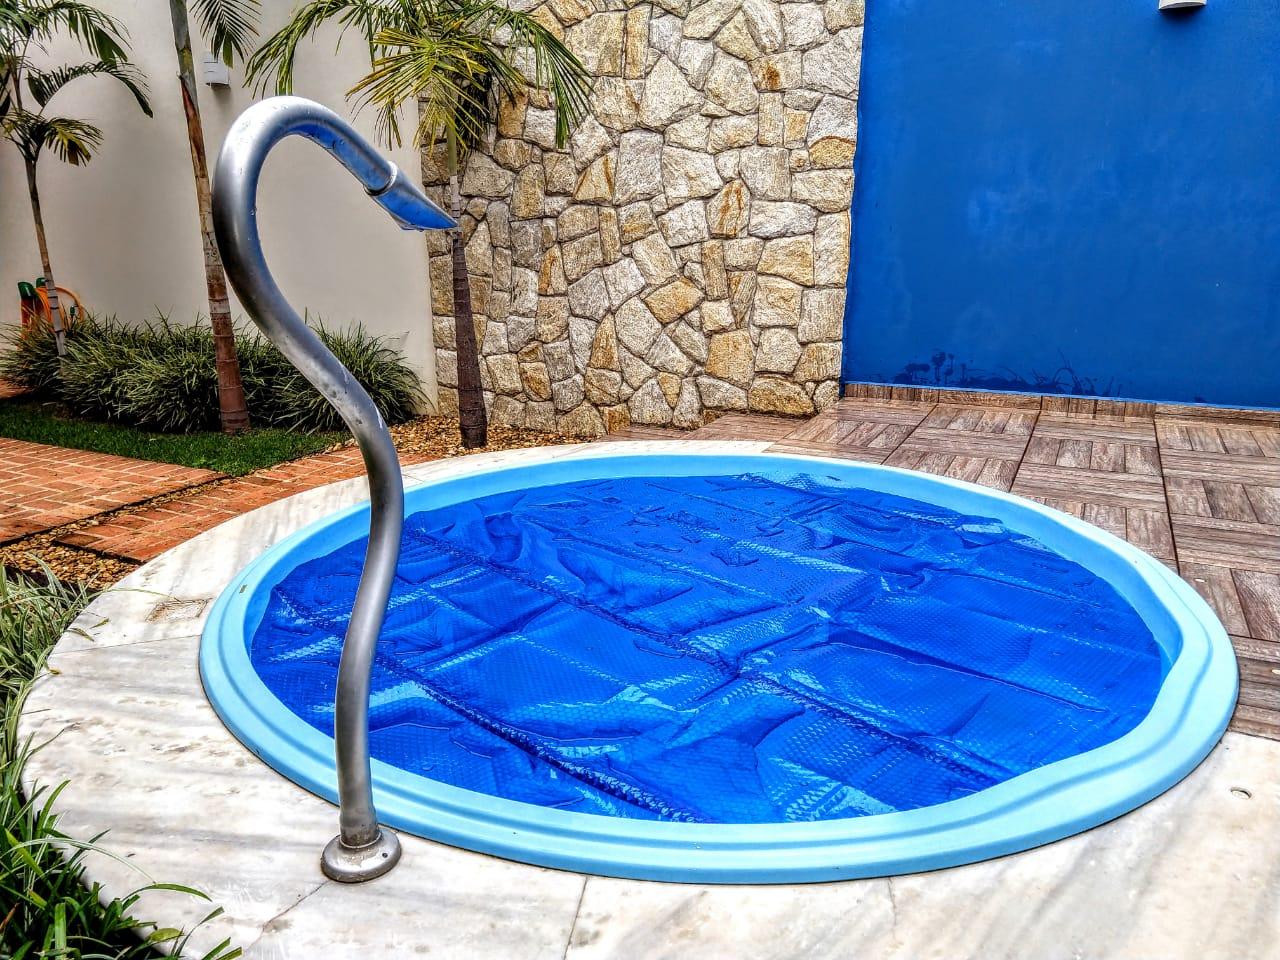 Capa Termica Bolha  4,50 X 2,50M - Brasil Capas (300 Micras)